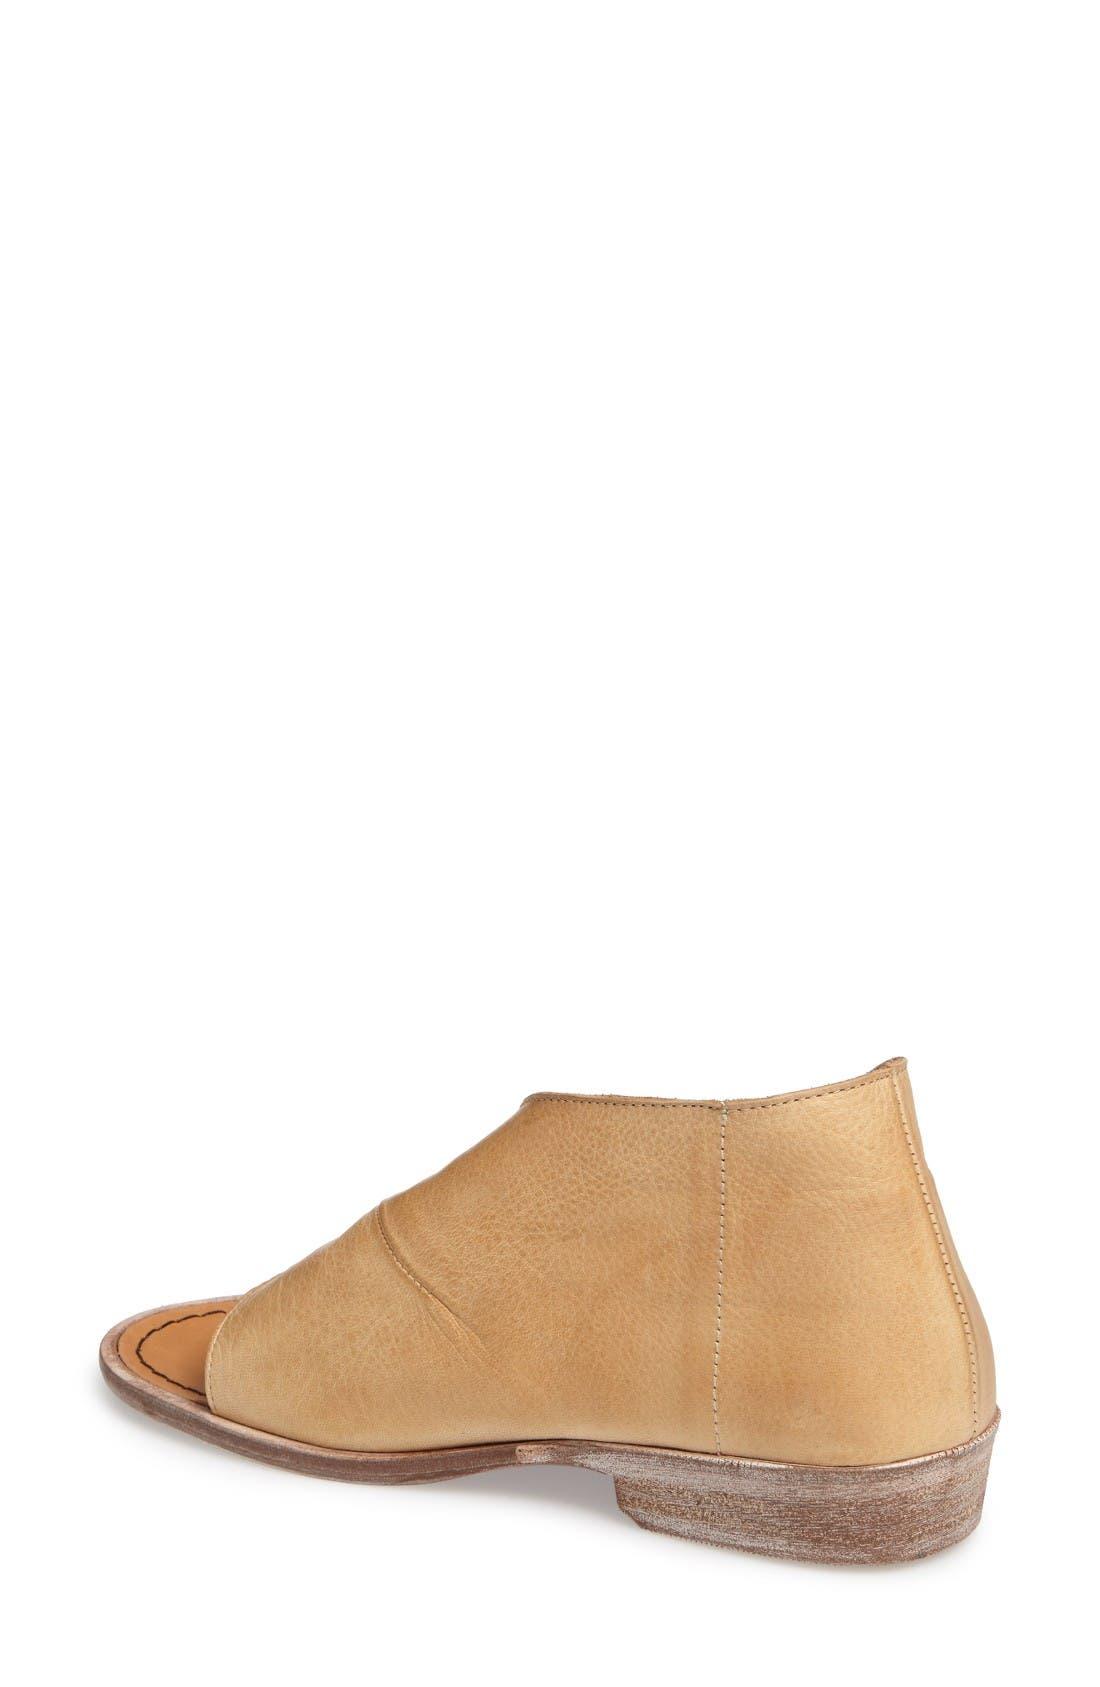 'Mont Blanc' Asymmetrical Sandal,                             Alternate thumbnail 2, color,                             Natural Leather